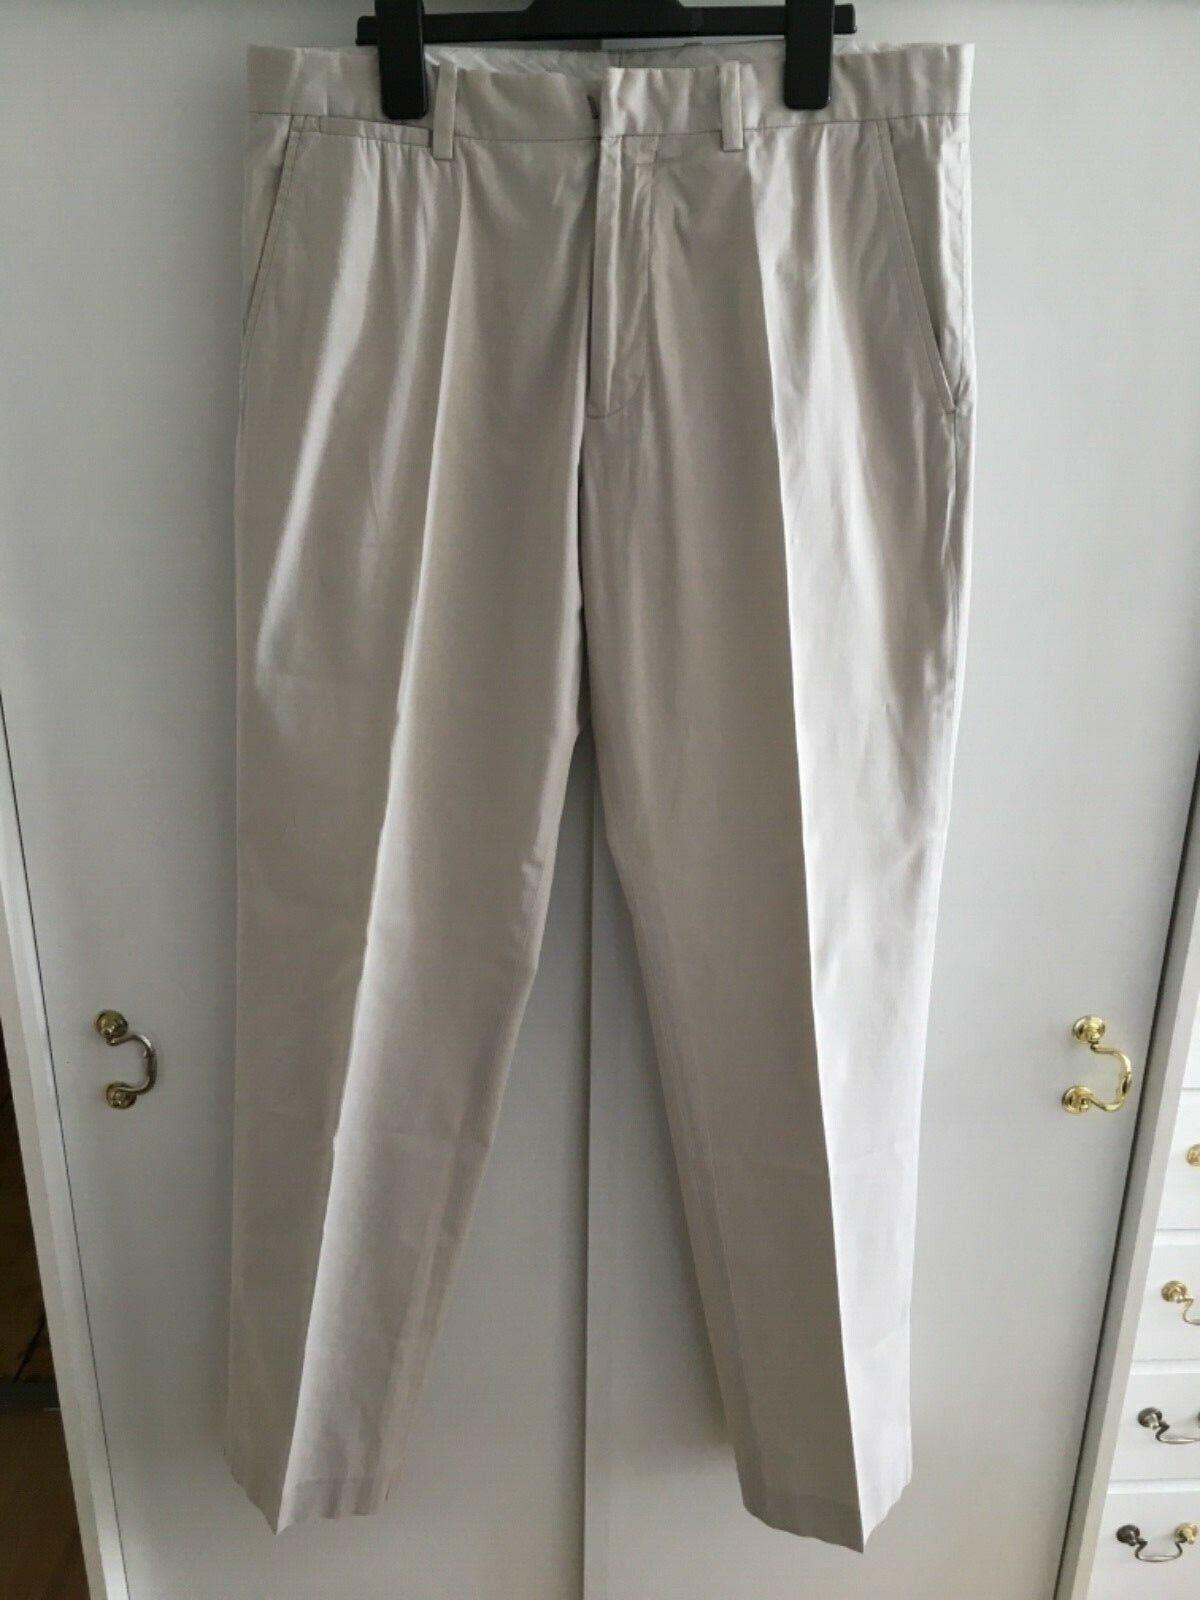 Theory men's trouser size 32, cotton